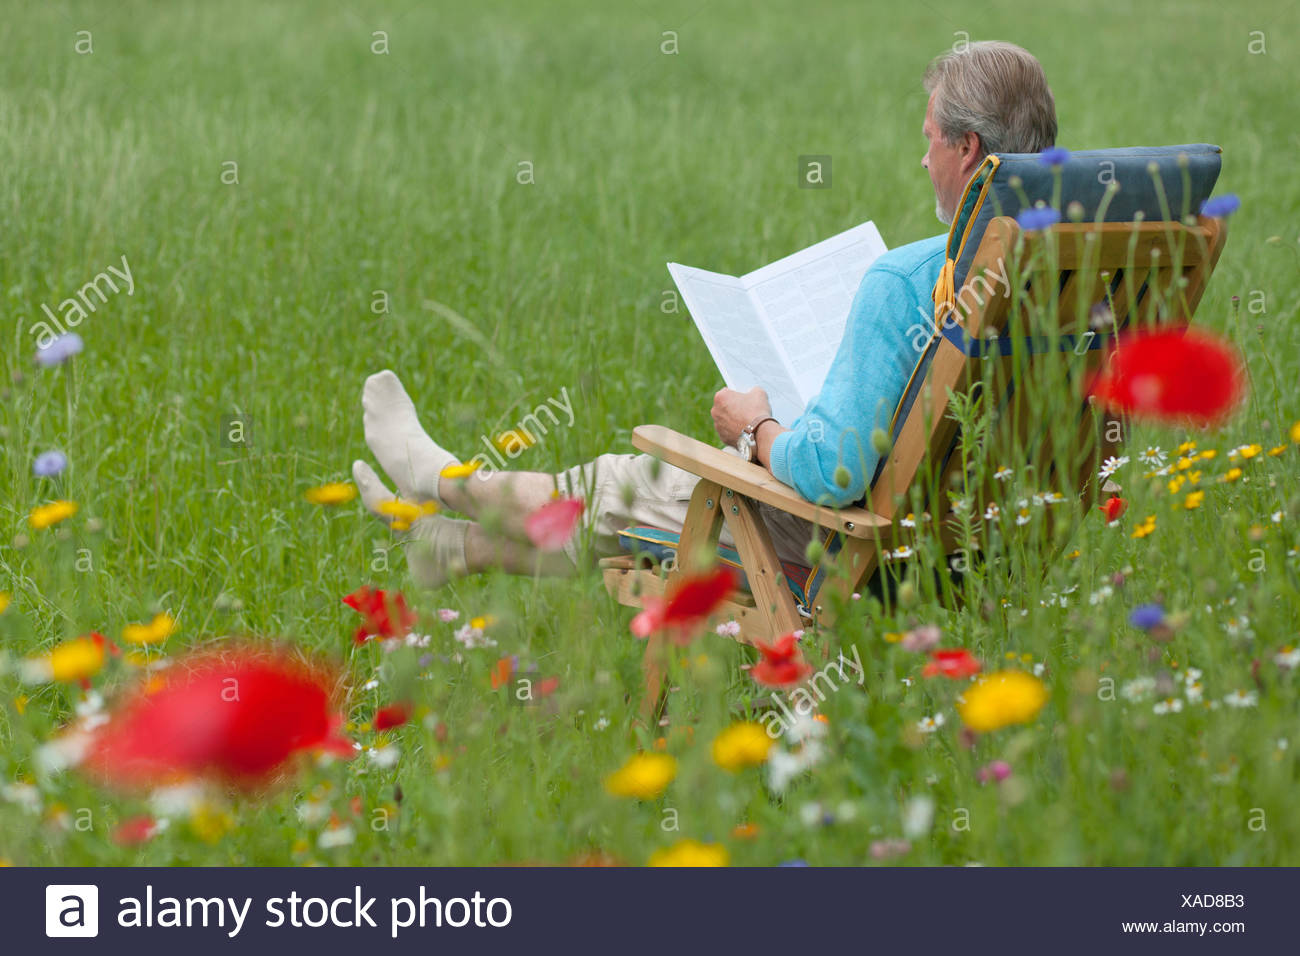 Elderly man readding in a garden chair on a flower meadow, Lower Saxony, Germany Stock Photo